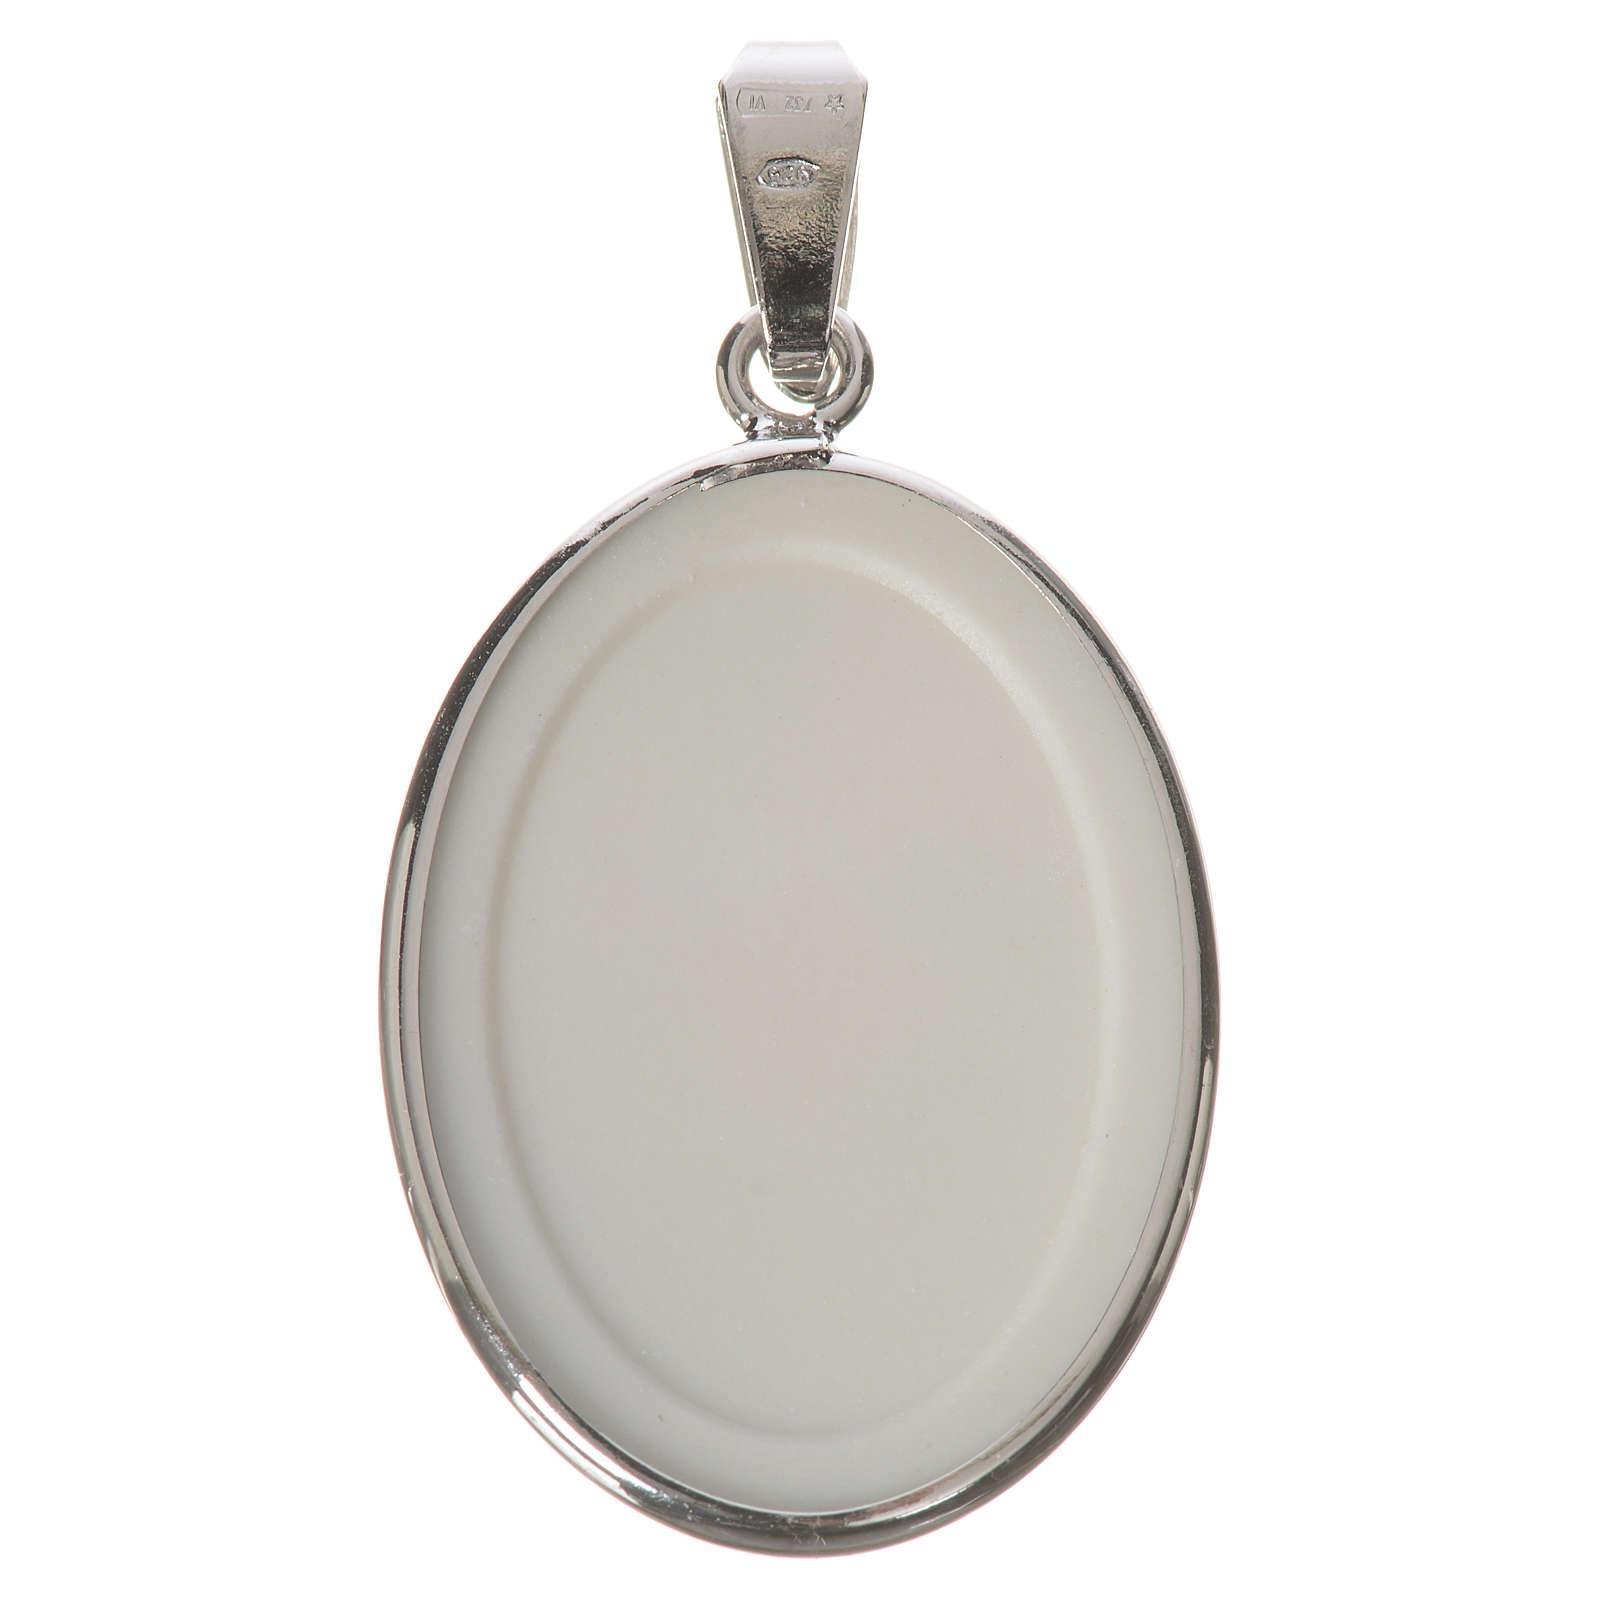 Medaglia ovale arg. 27 mm S. Pio 4